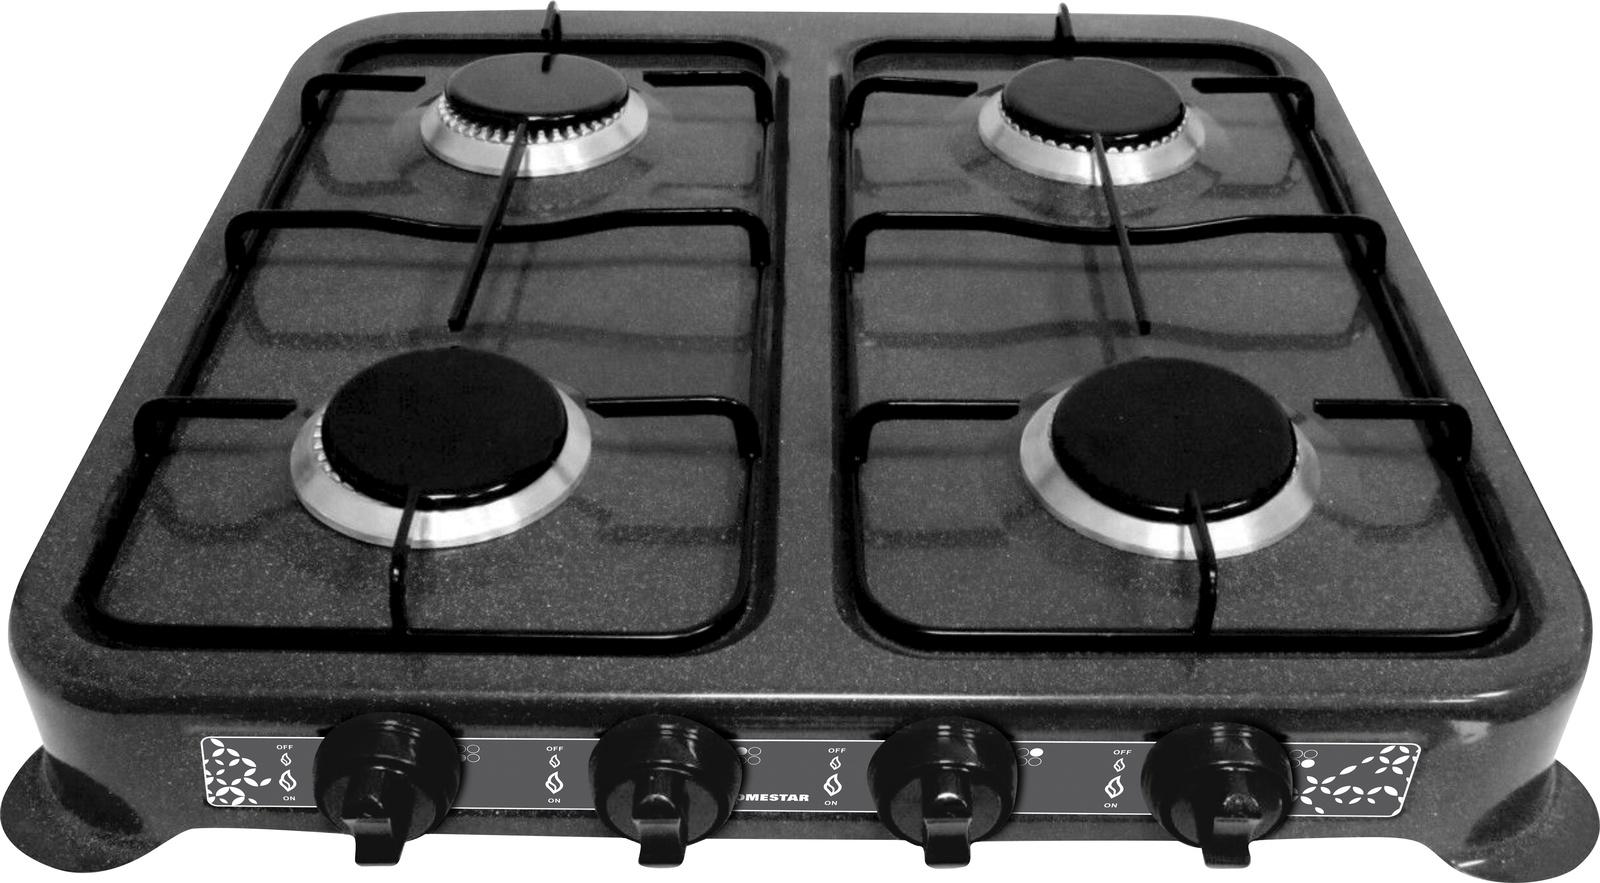 лучшая цена Настольная плита HOMESTAR HS-1204, 54 003701, черный